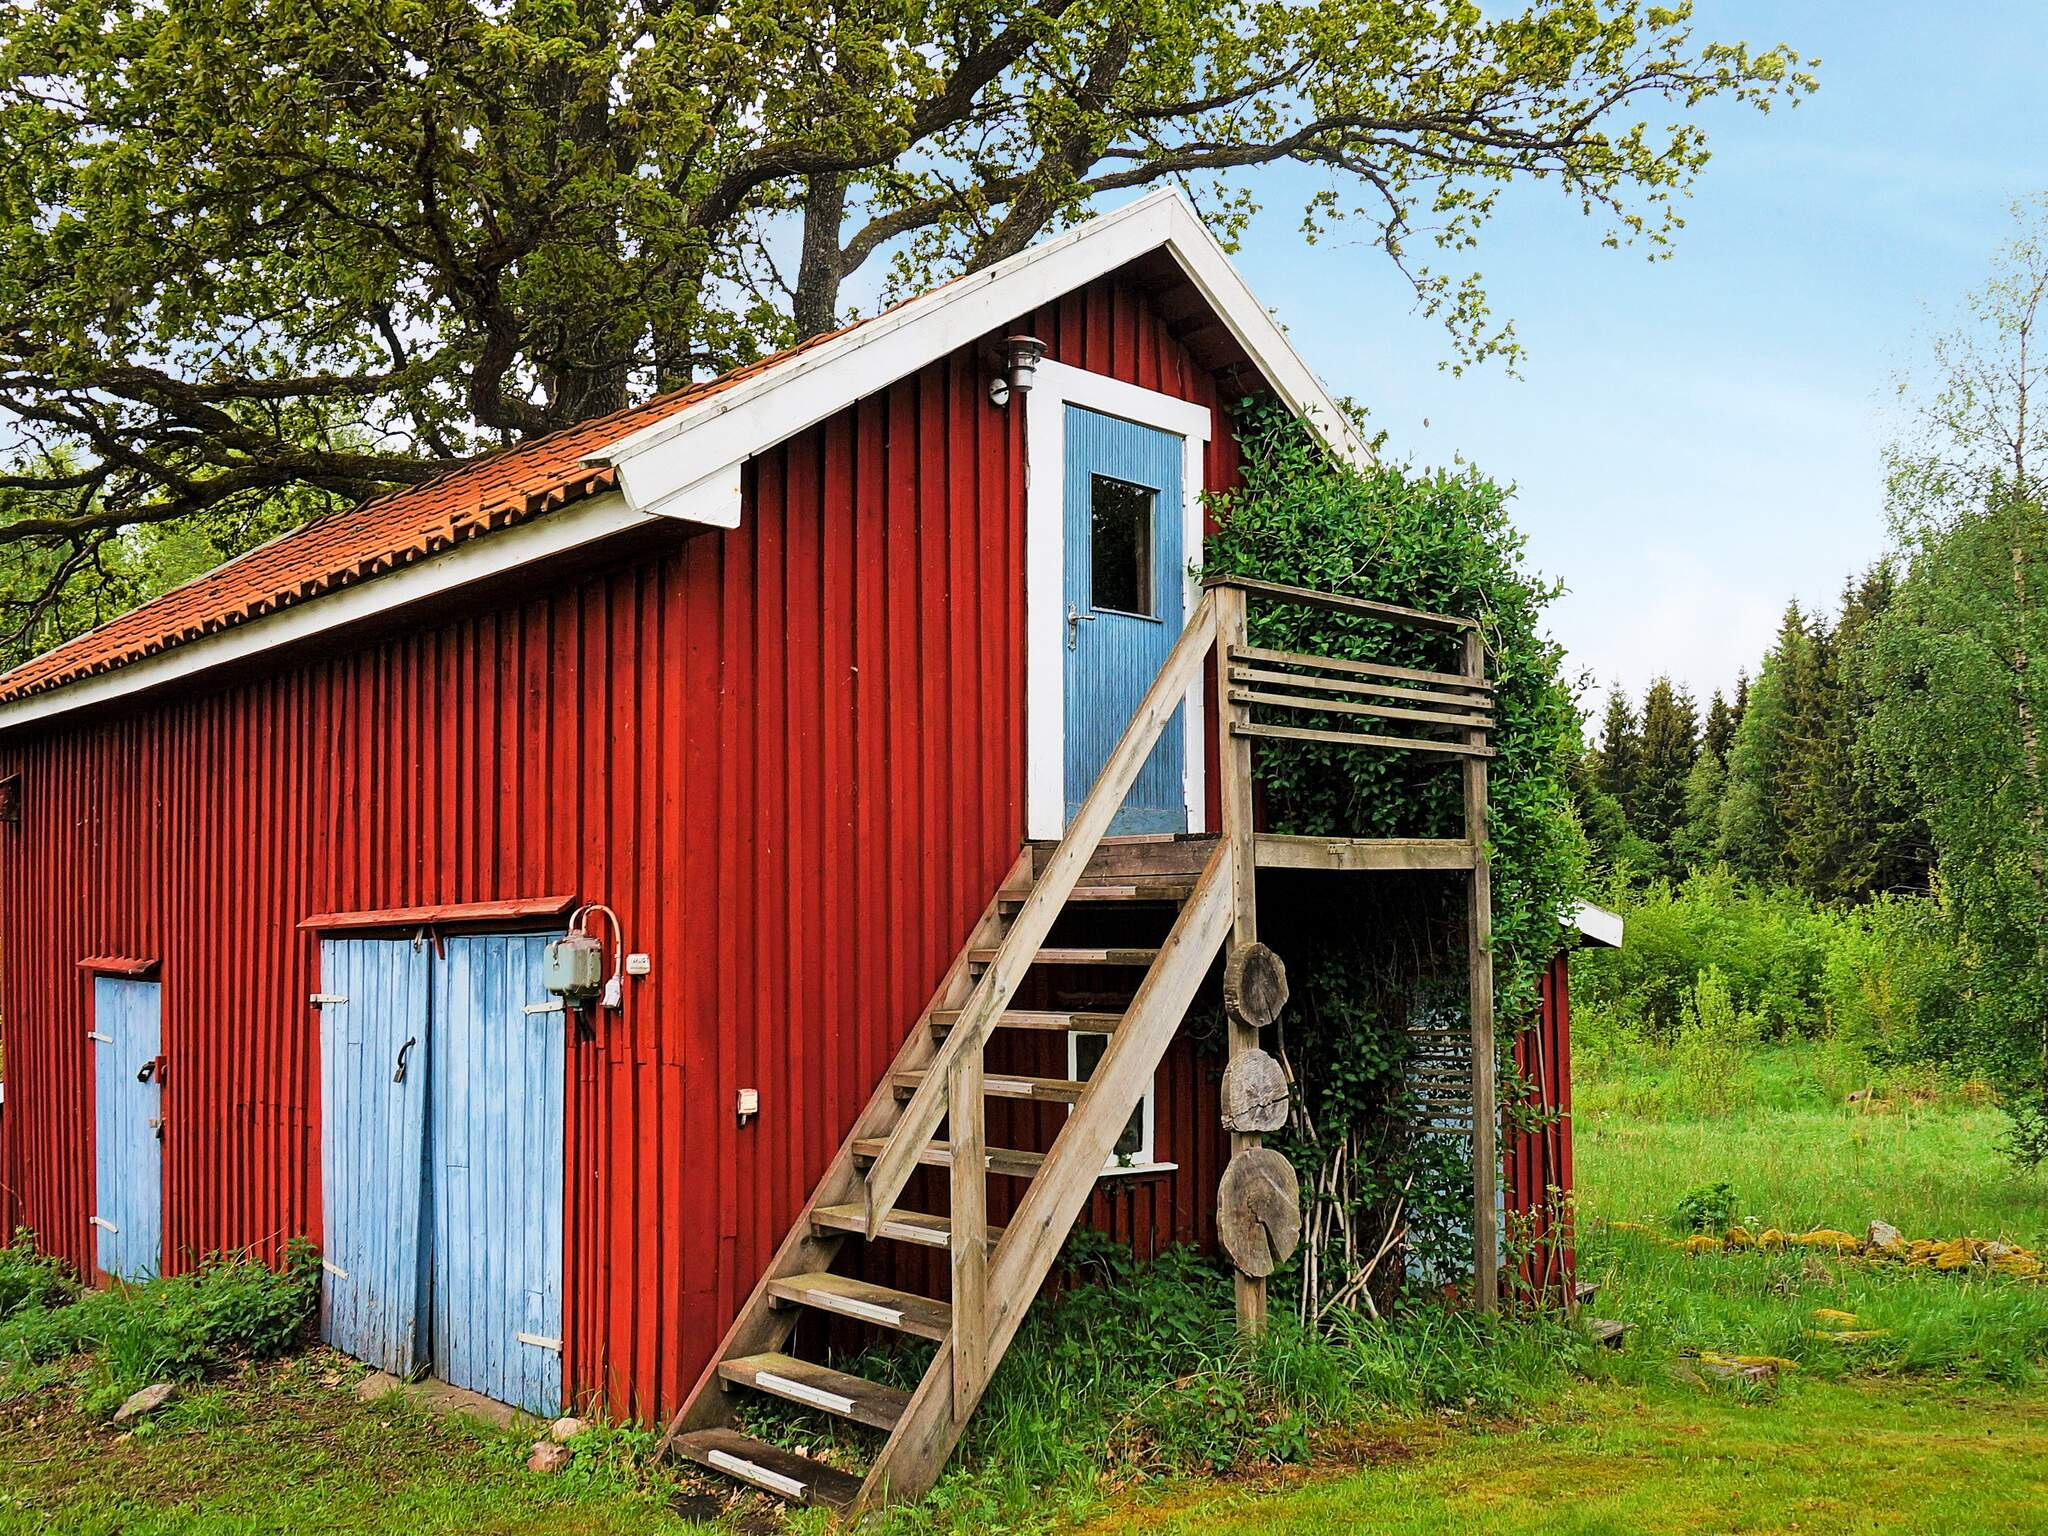 Ferienhaus Falköping (2636837), Trädet, Västra Götaland län, Westschweden, Schweden, Bild 25